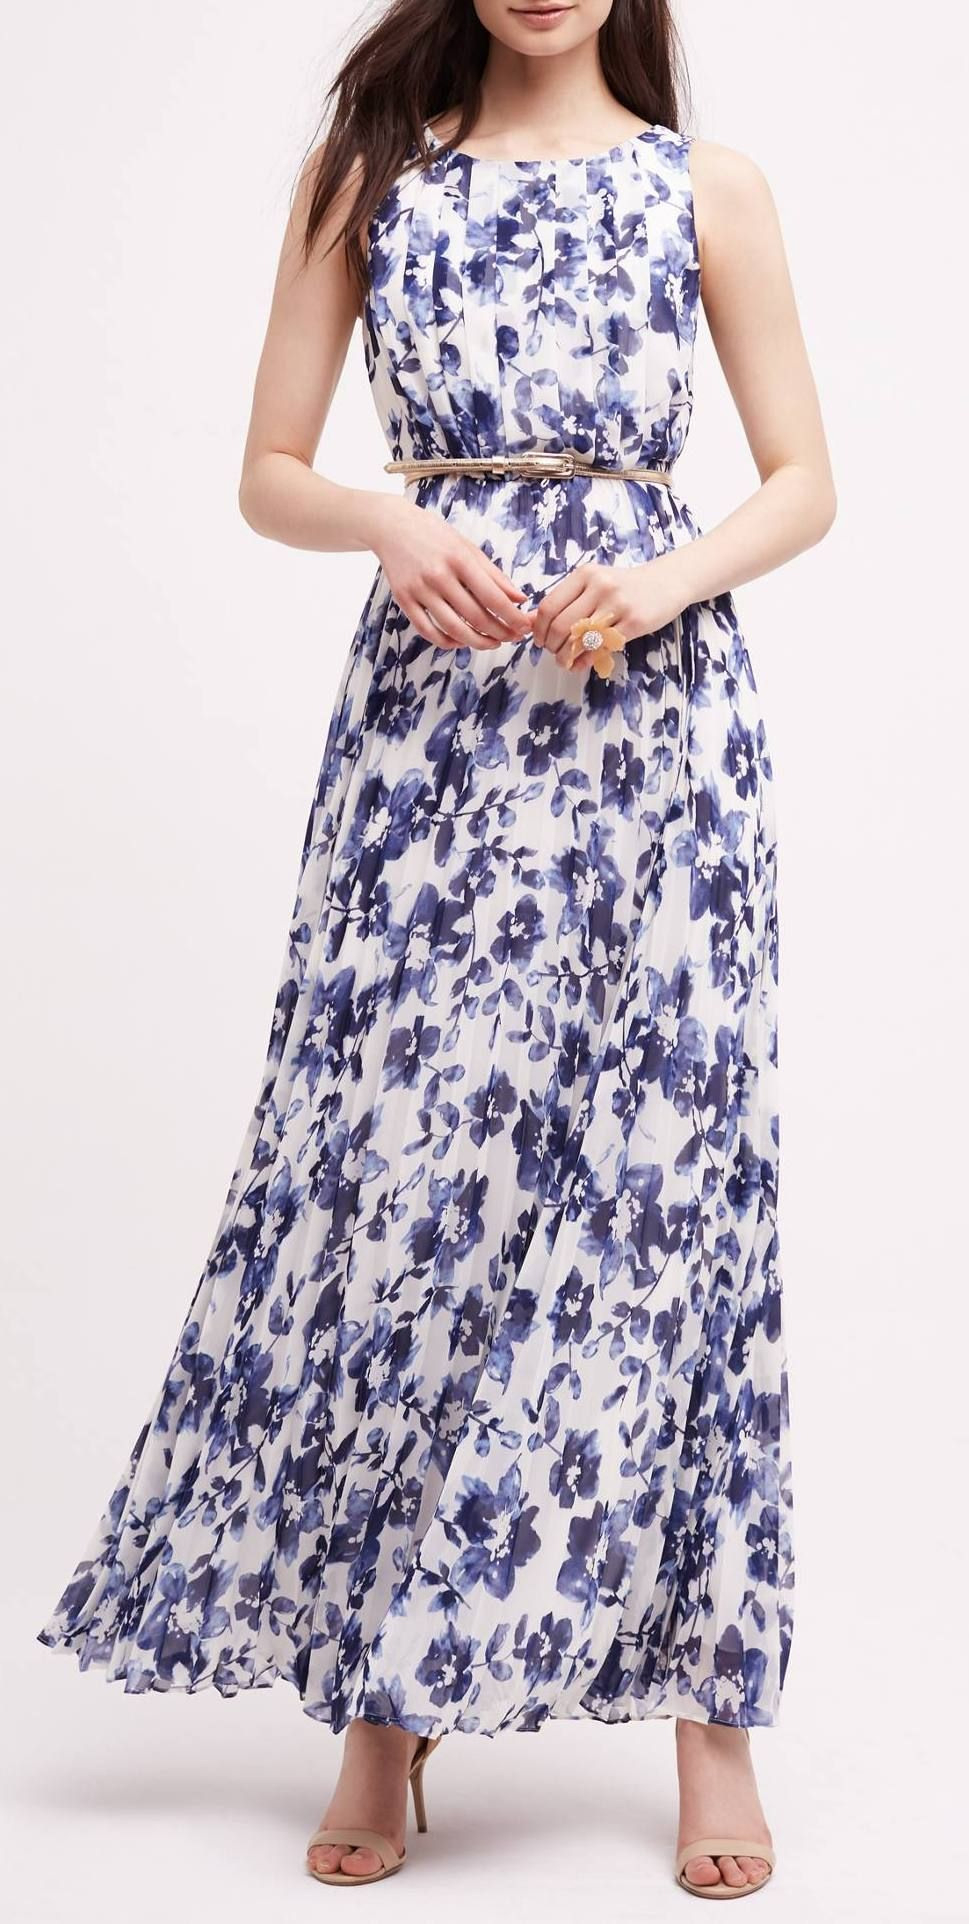 Blue  White Floral Maxi Dress  Schicke Kleidung